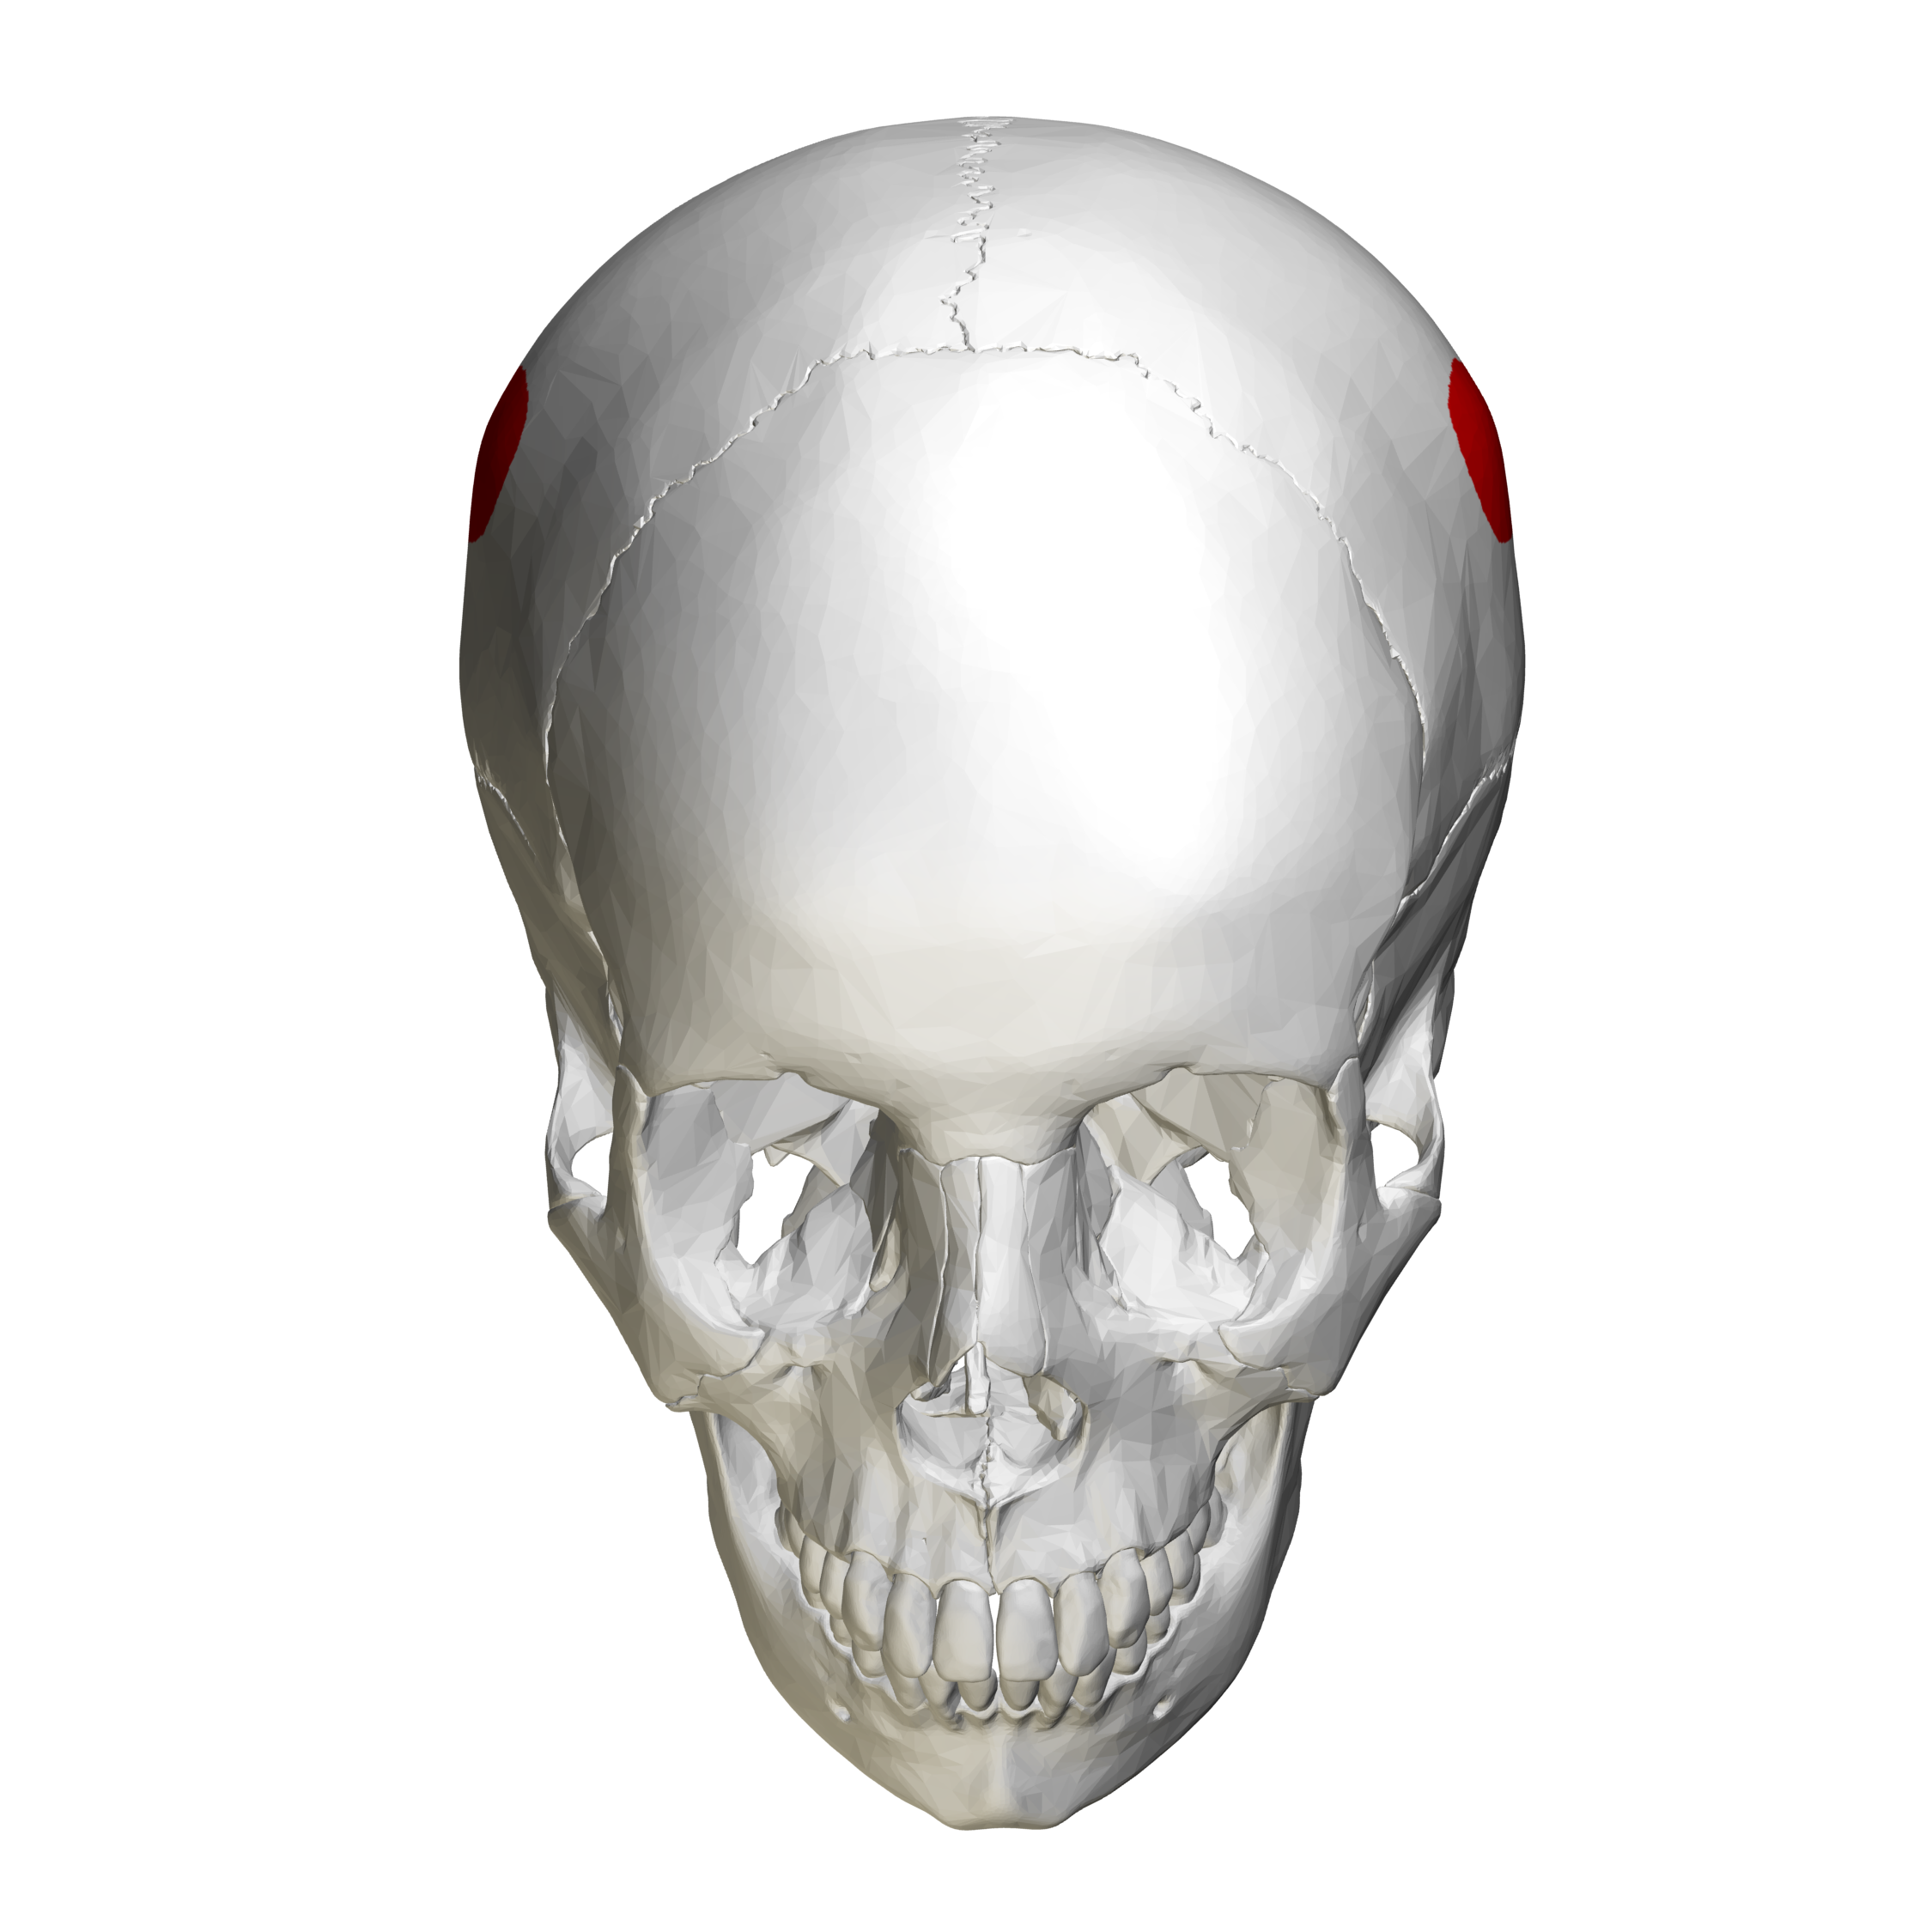 Fileparietal Eminence Skull Anterior View00g Wikimedia Commons